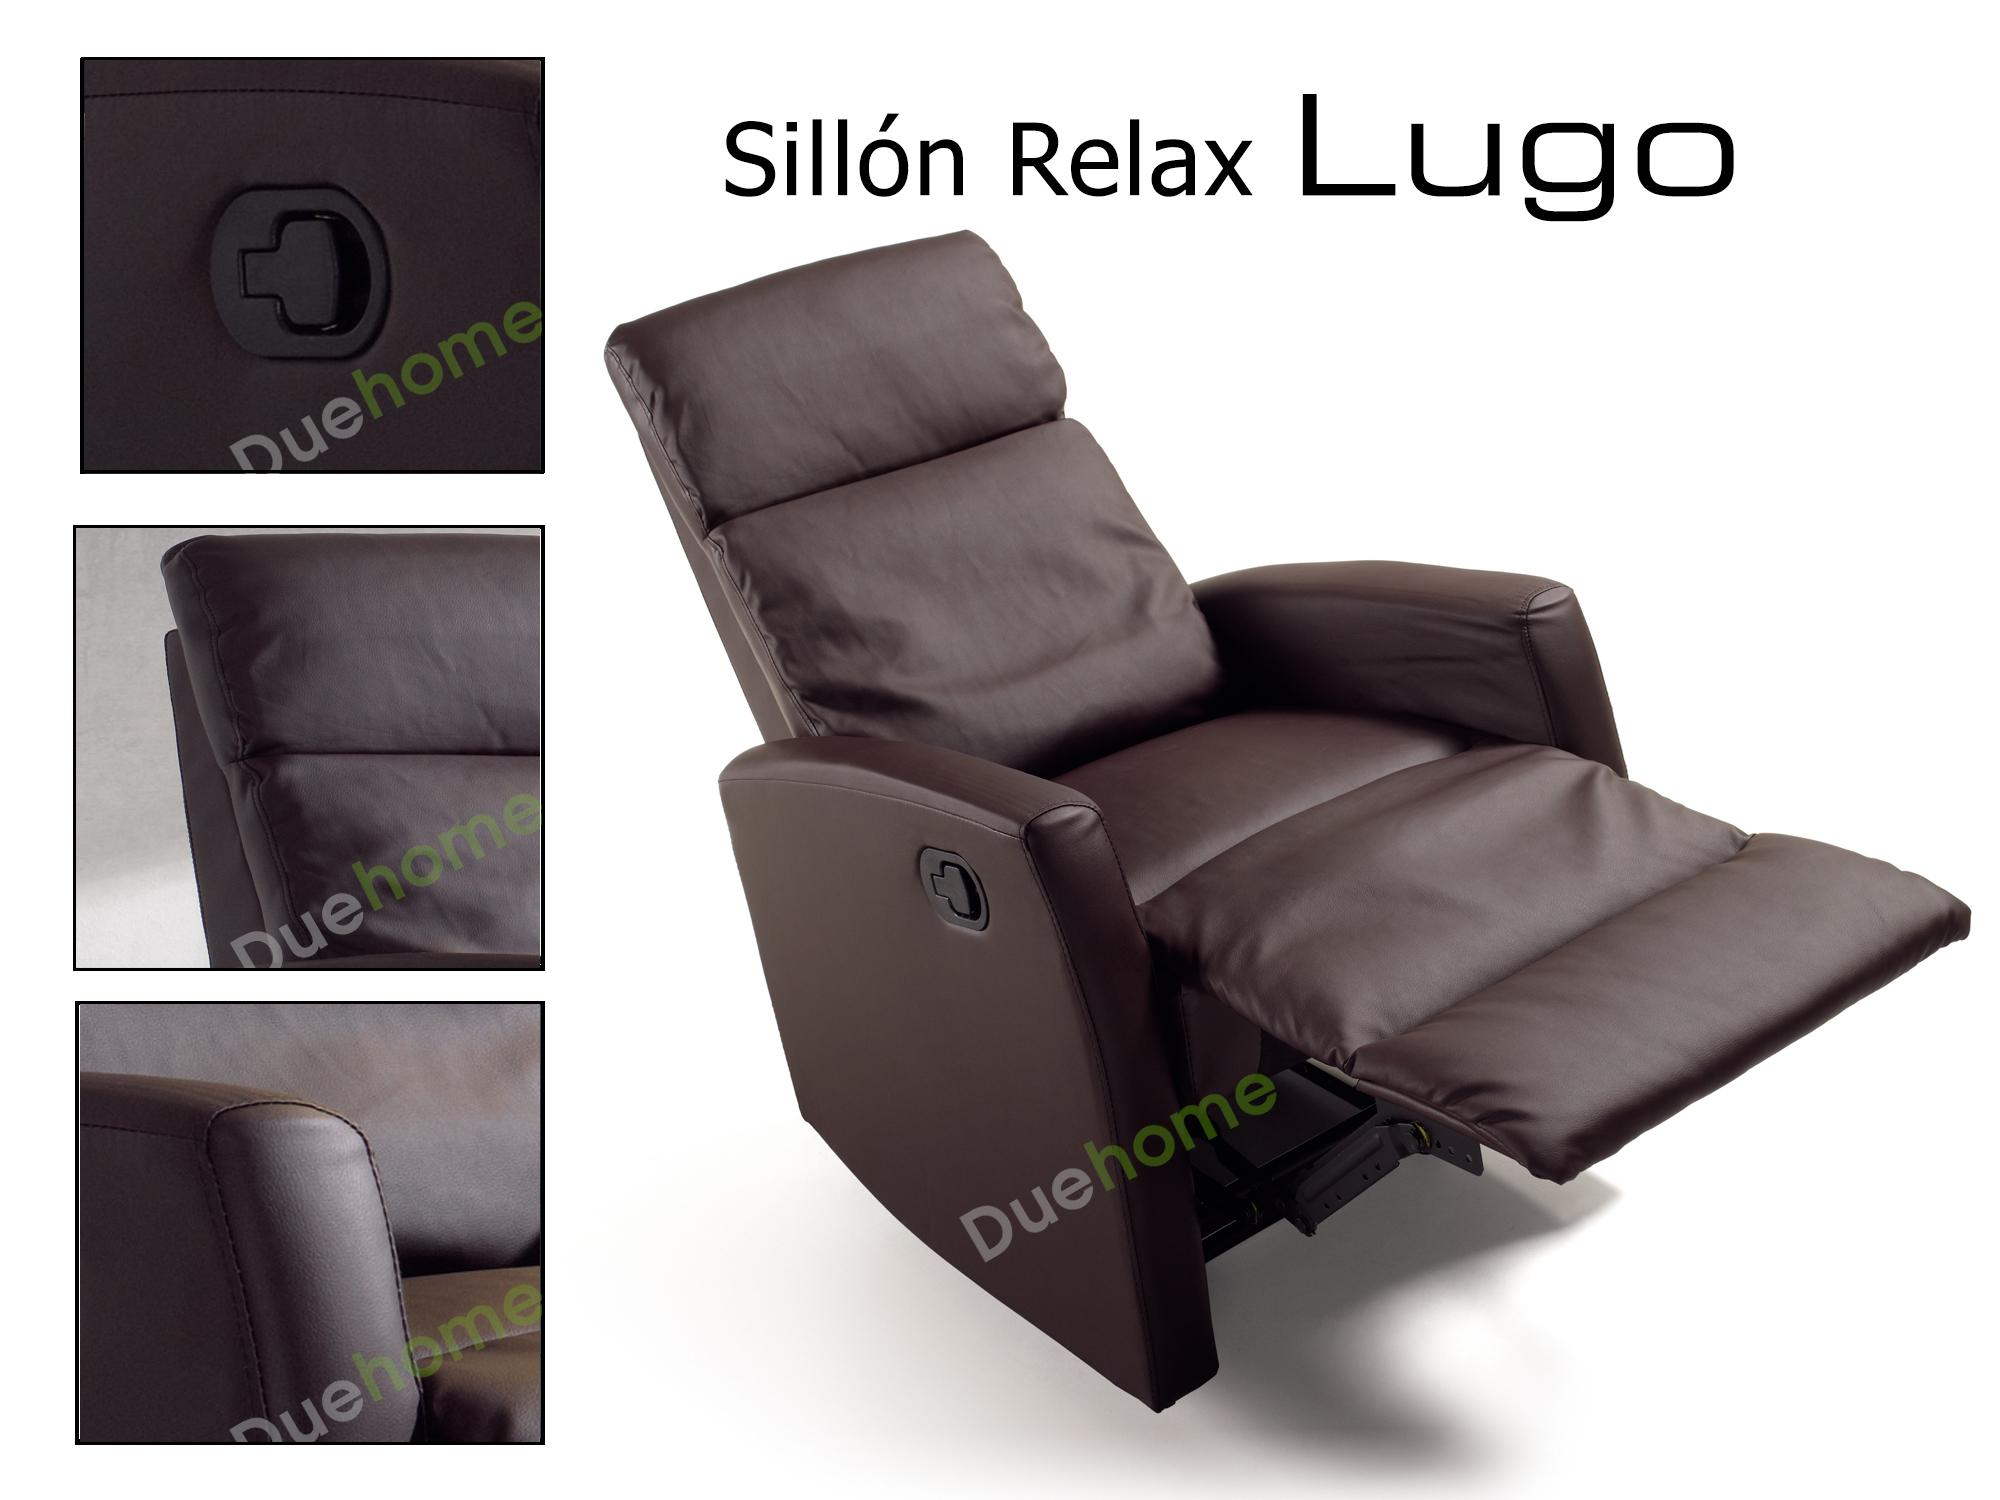 Sillon relax reclinable marron ebay - Sillones reclinables relax ...